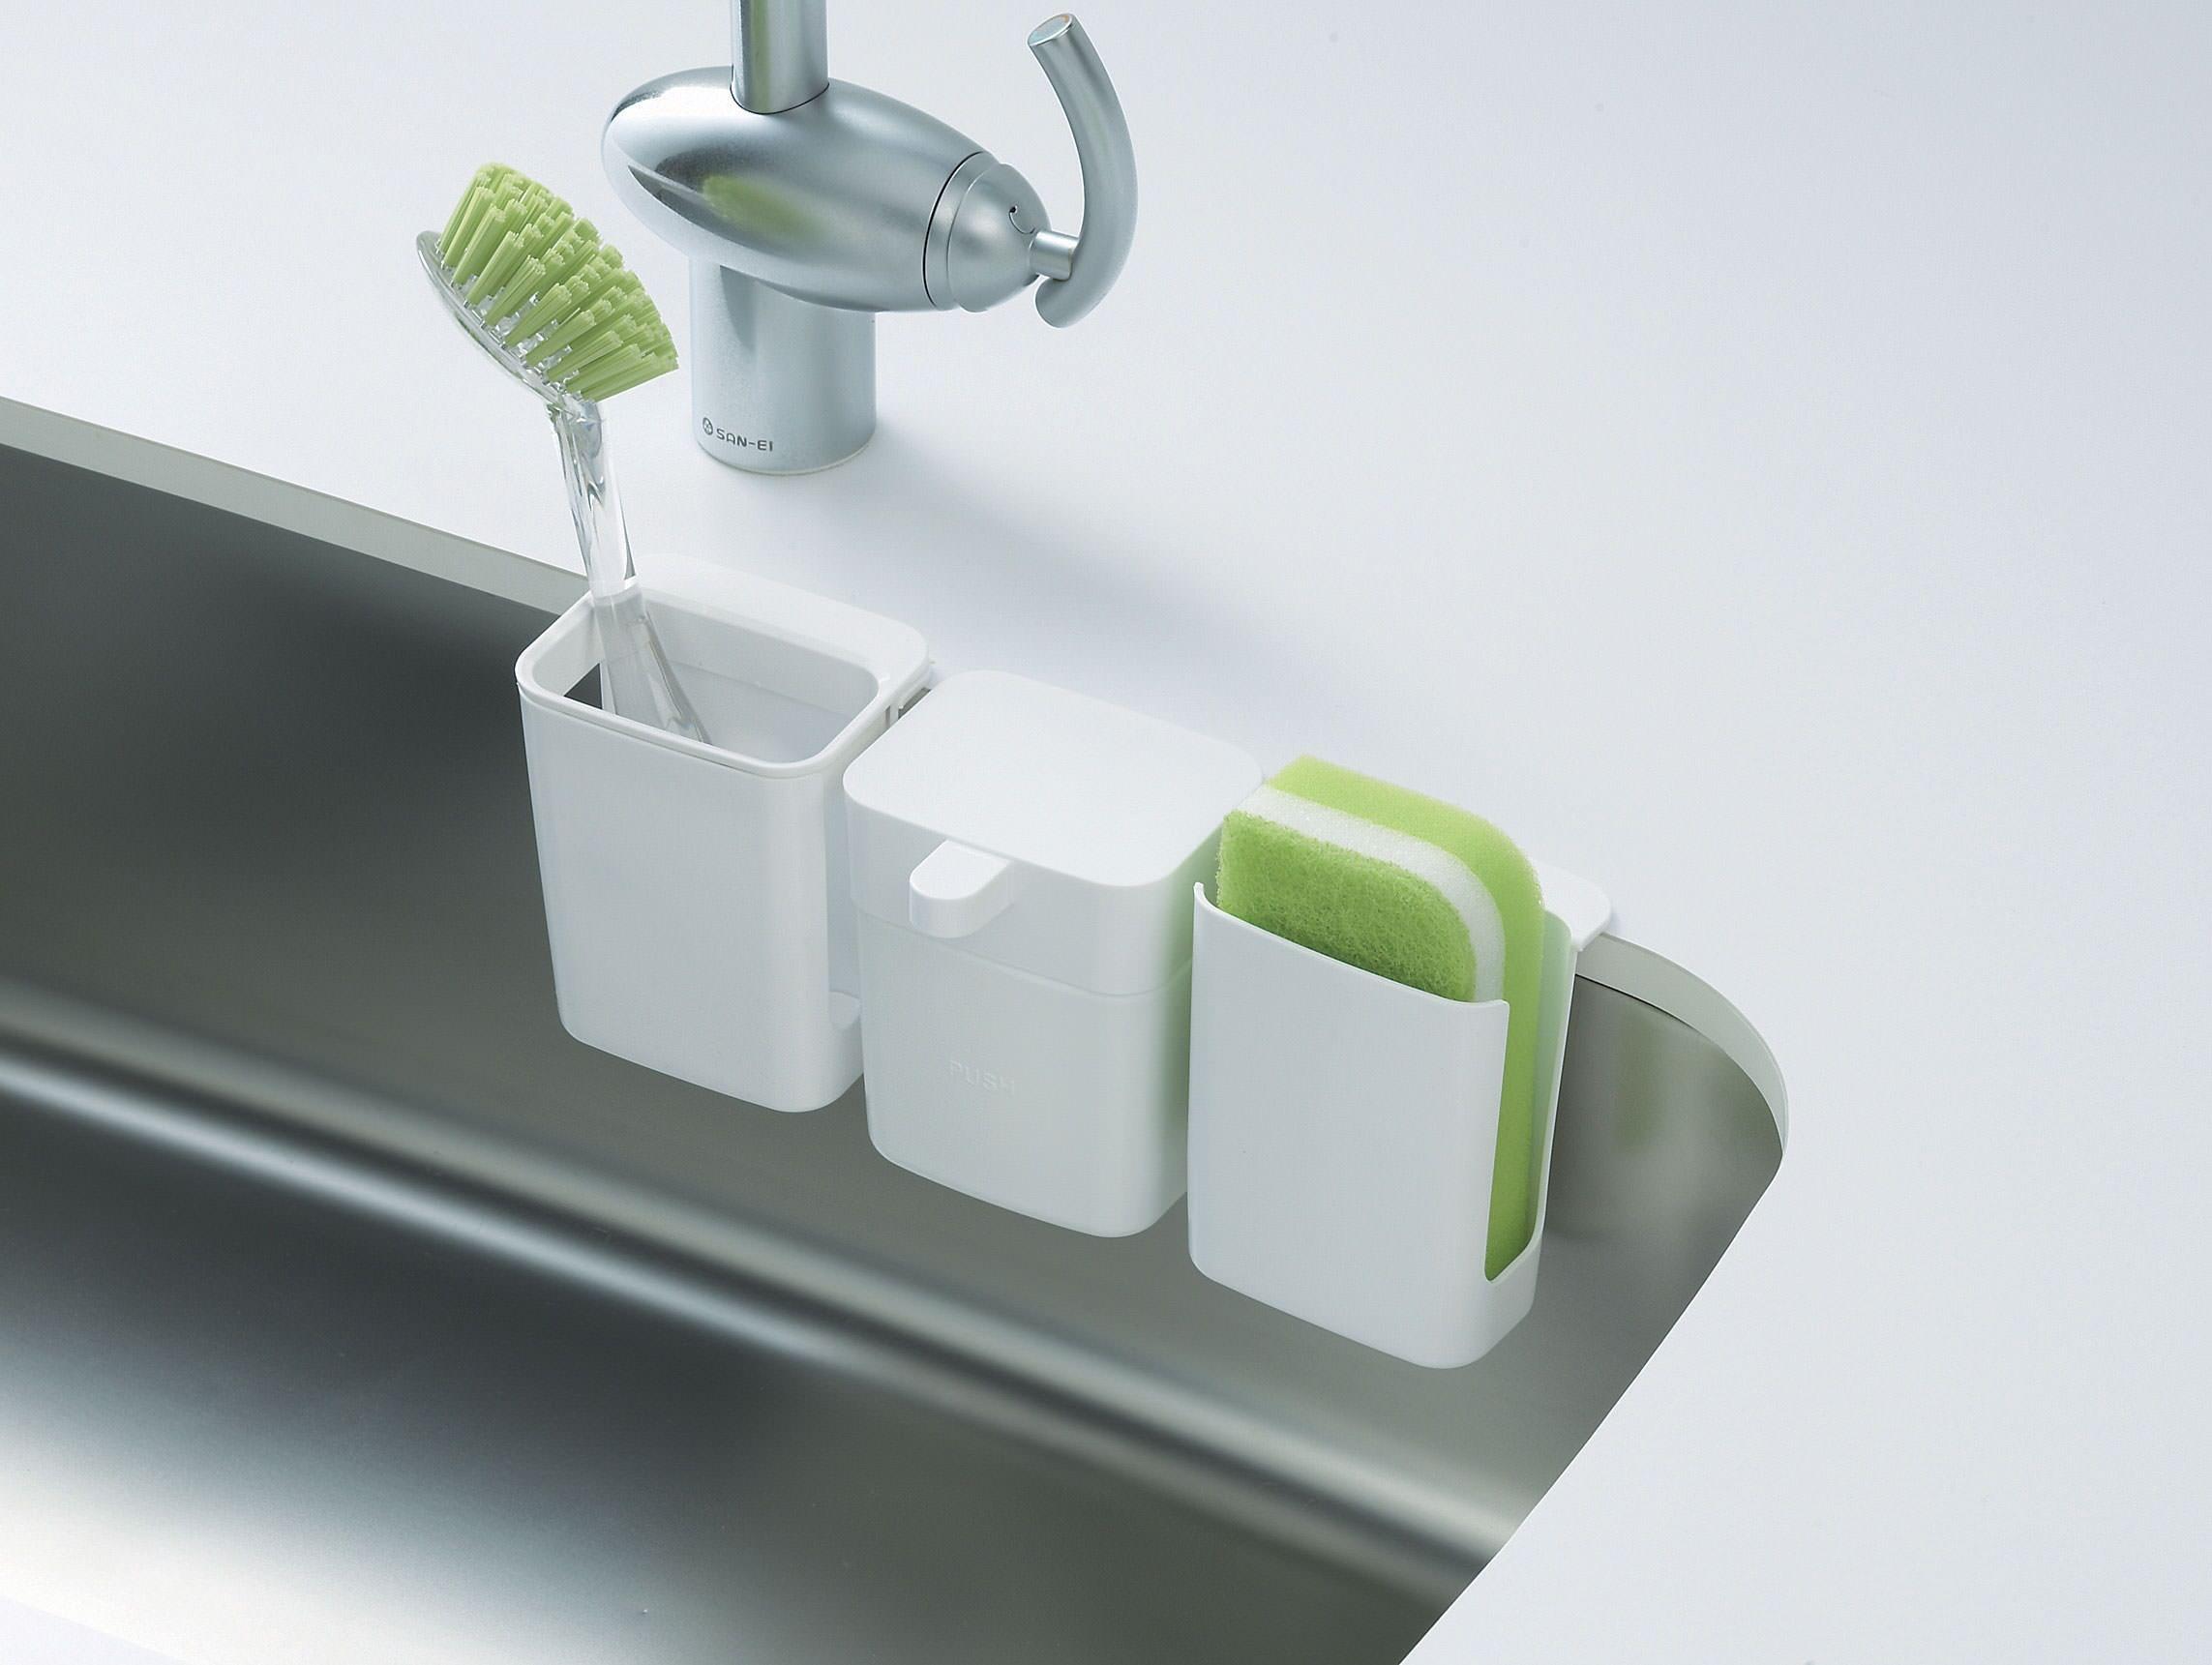 Ideas, kitchen sinks sponge brush holder kitchen sink backup main line with sizing 2286 x 1721  .